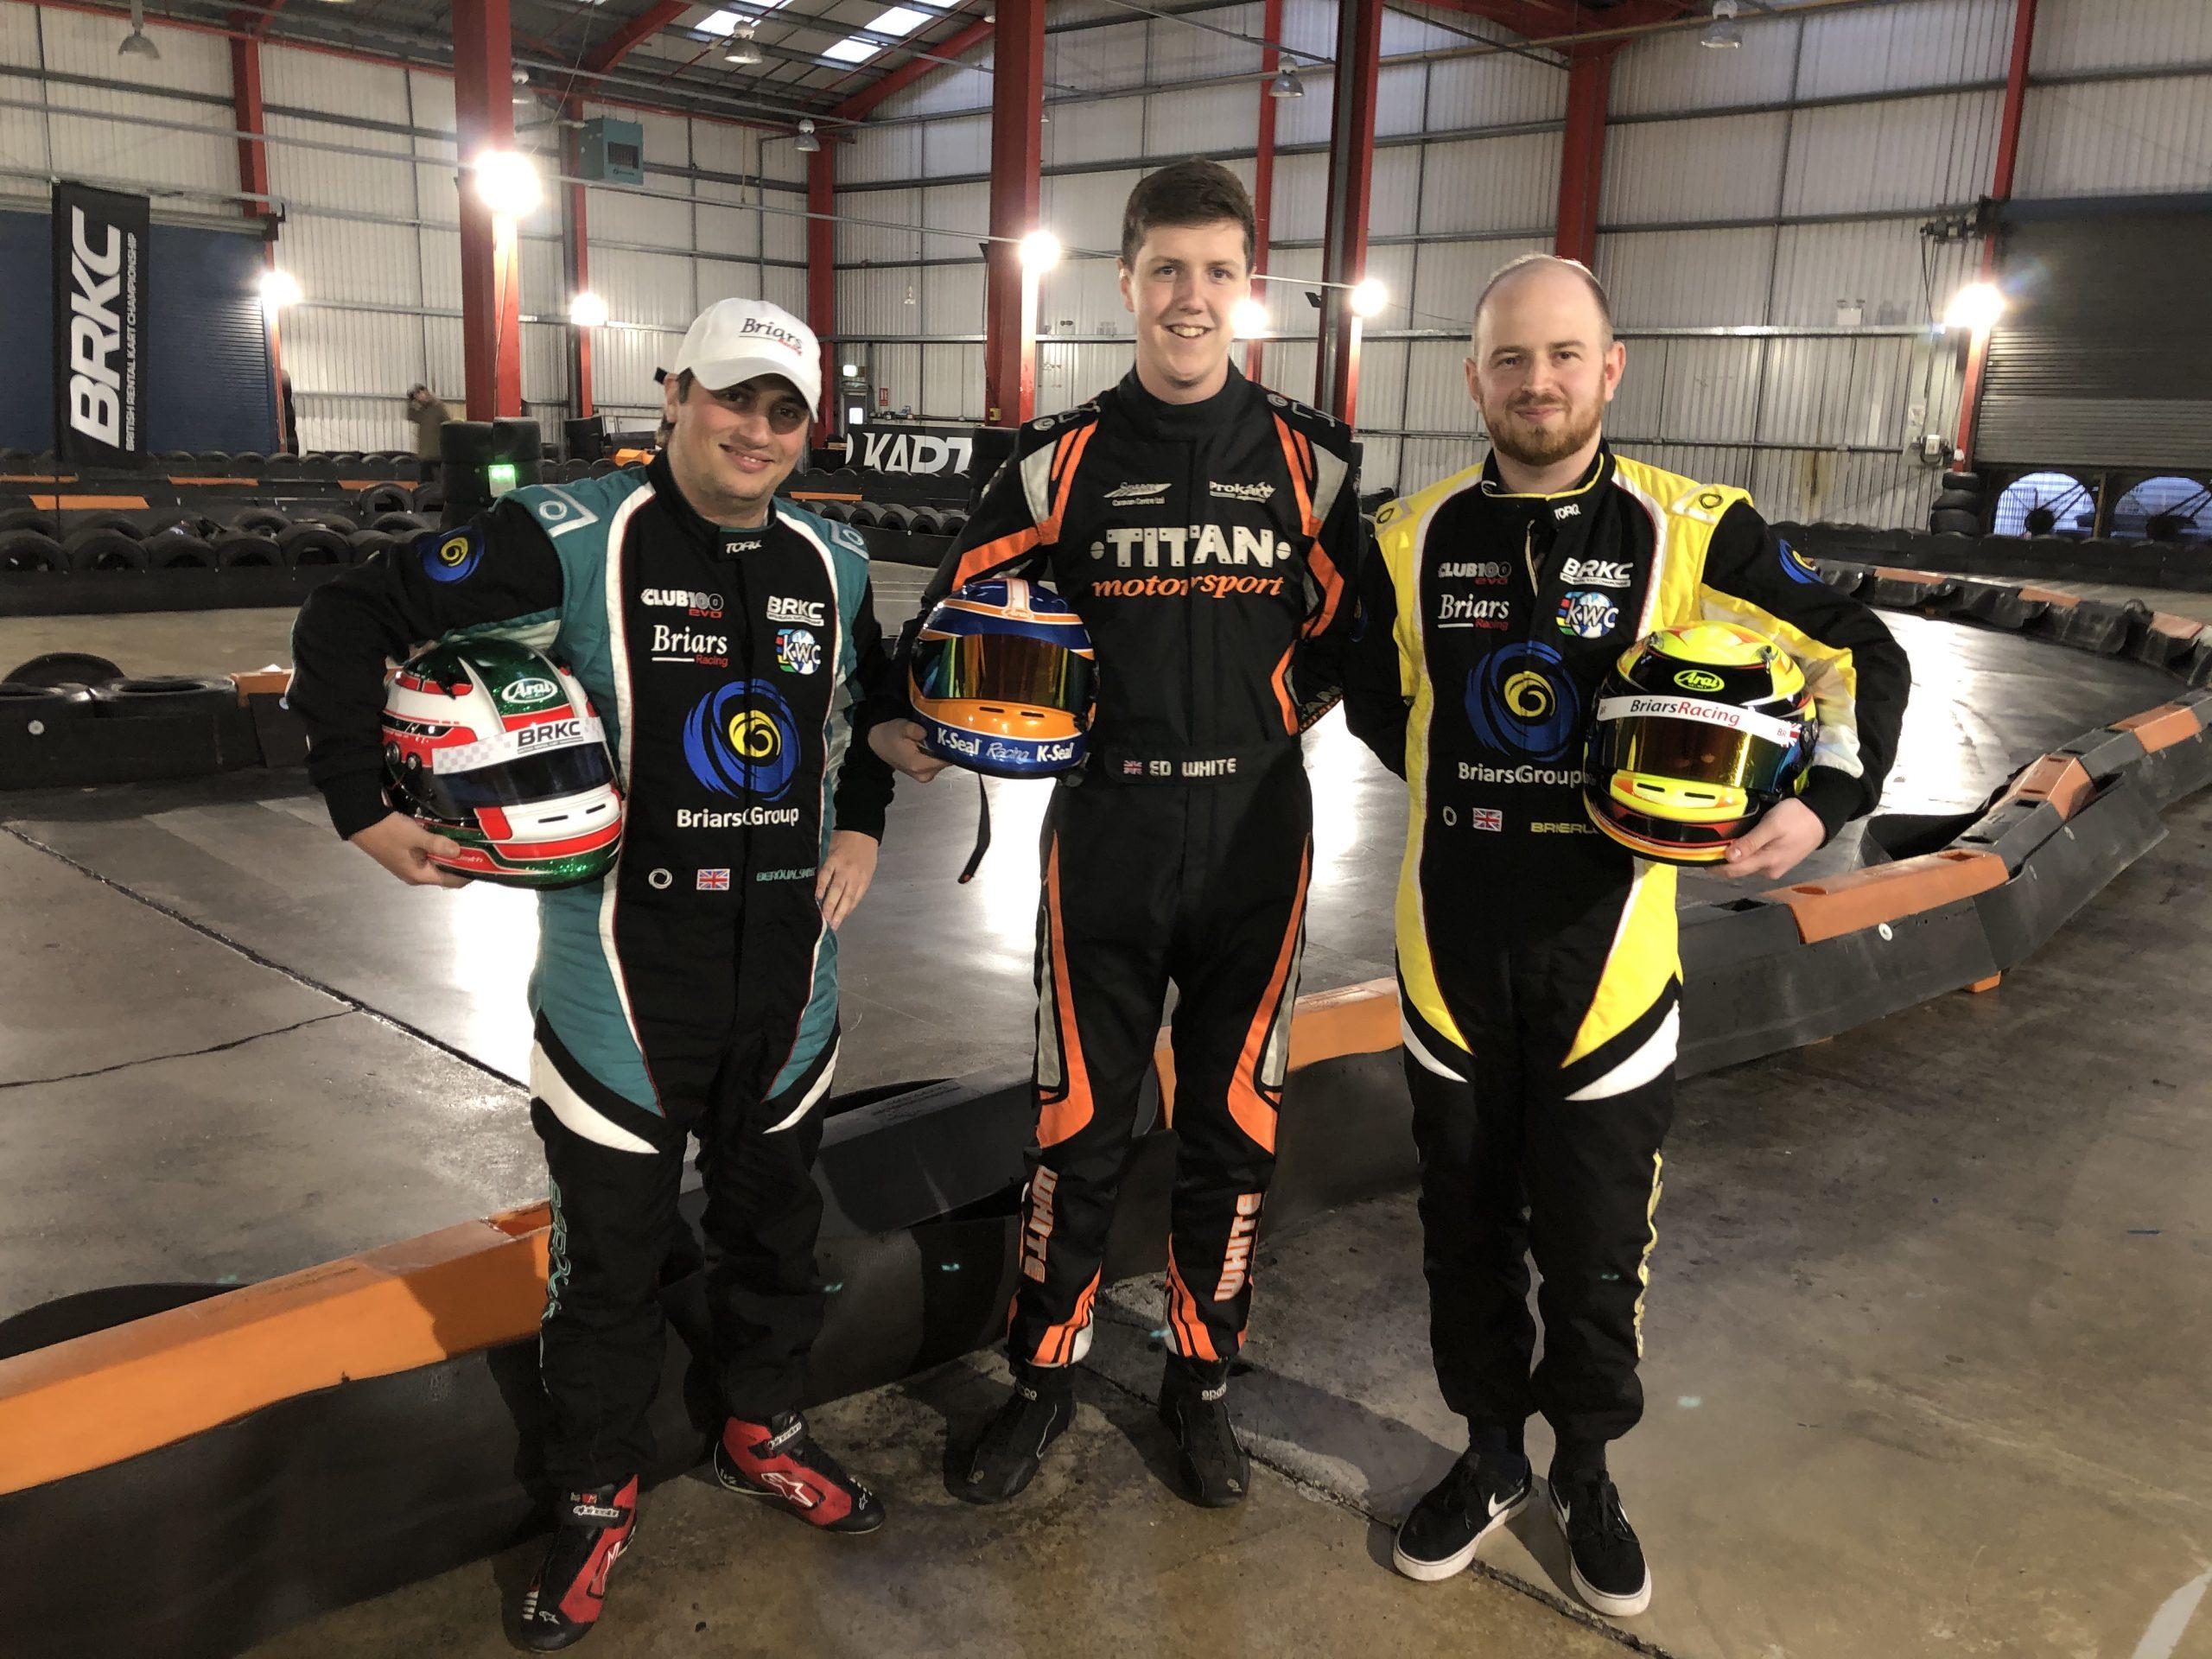 Briars Racing Team